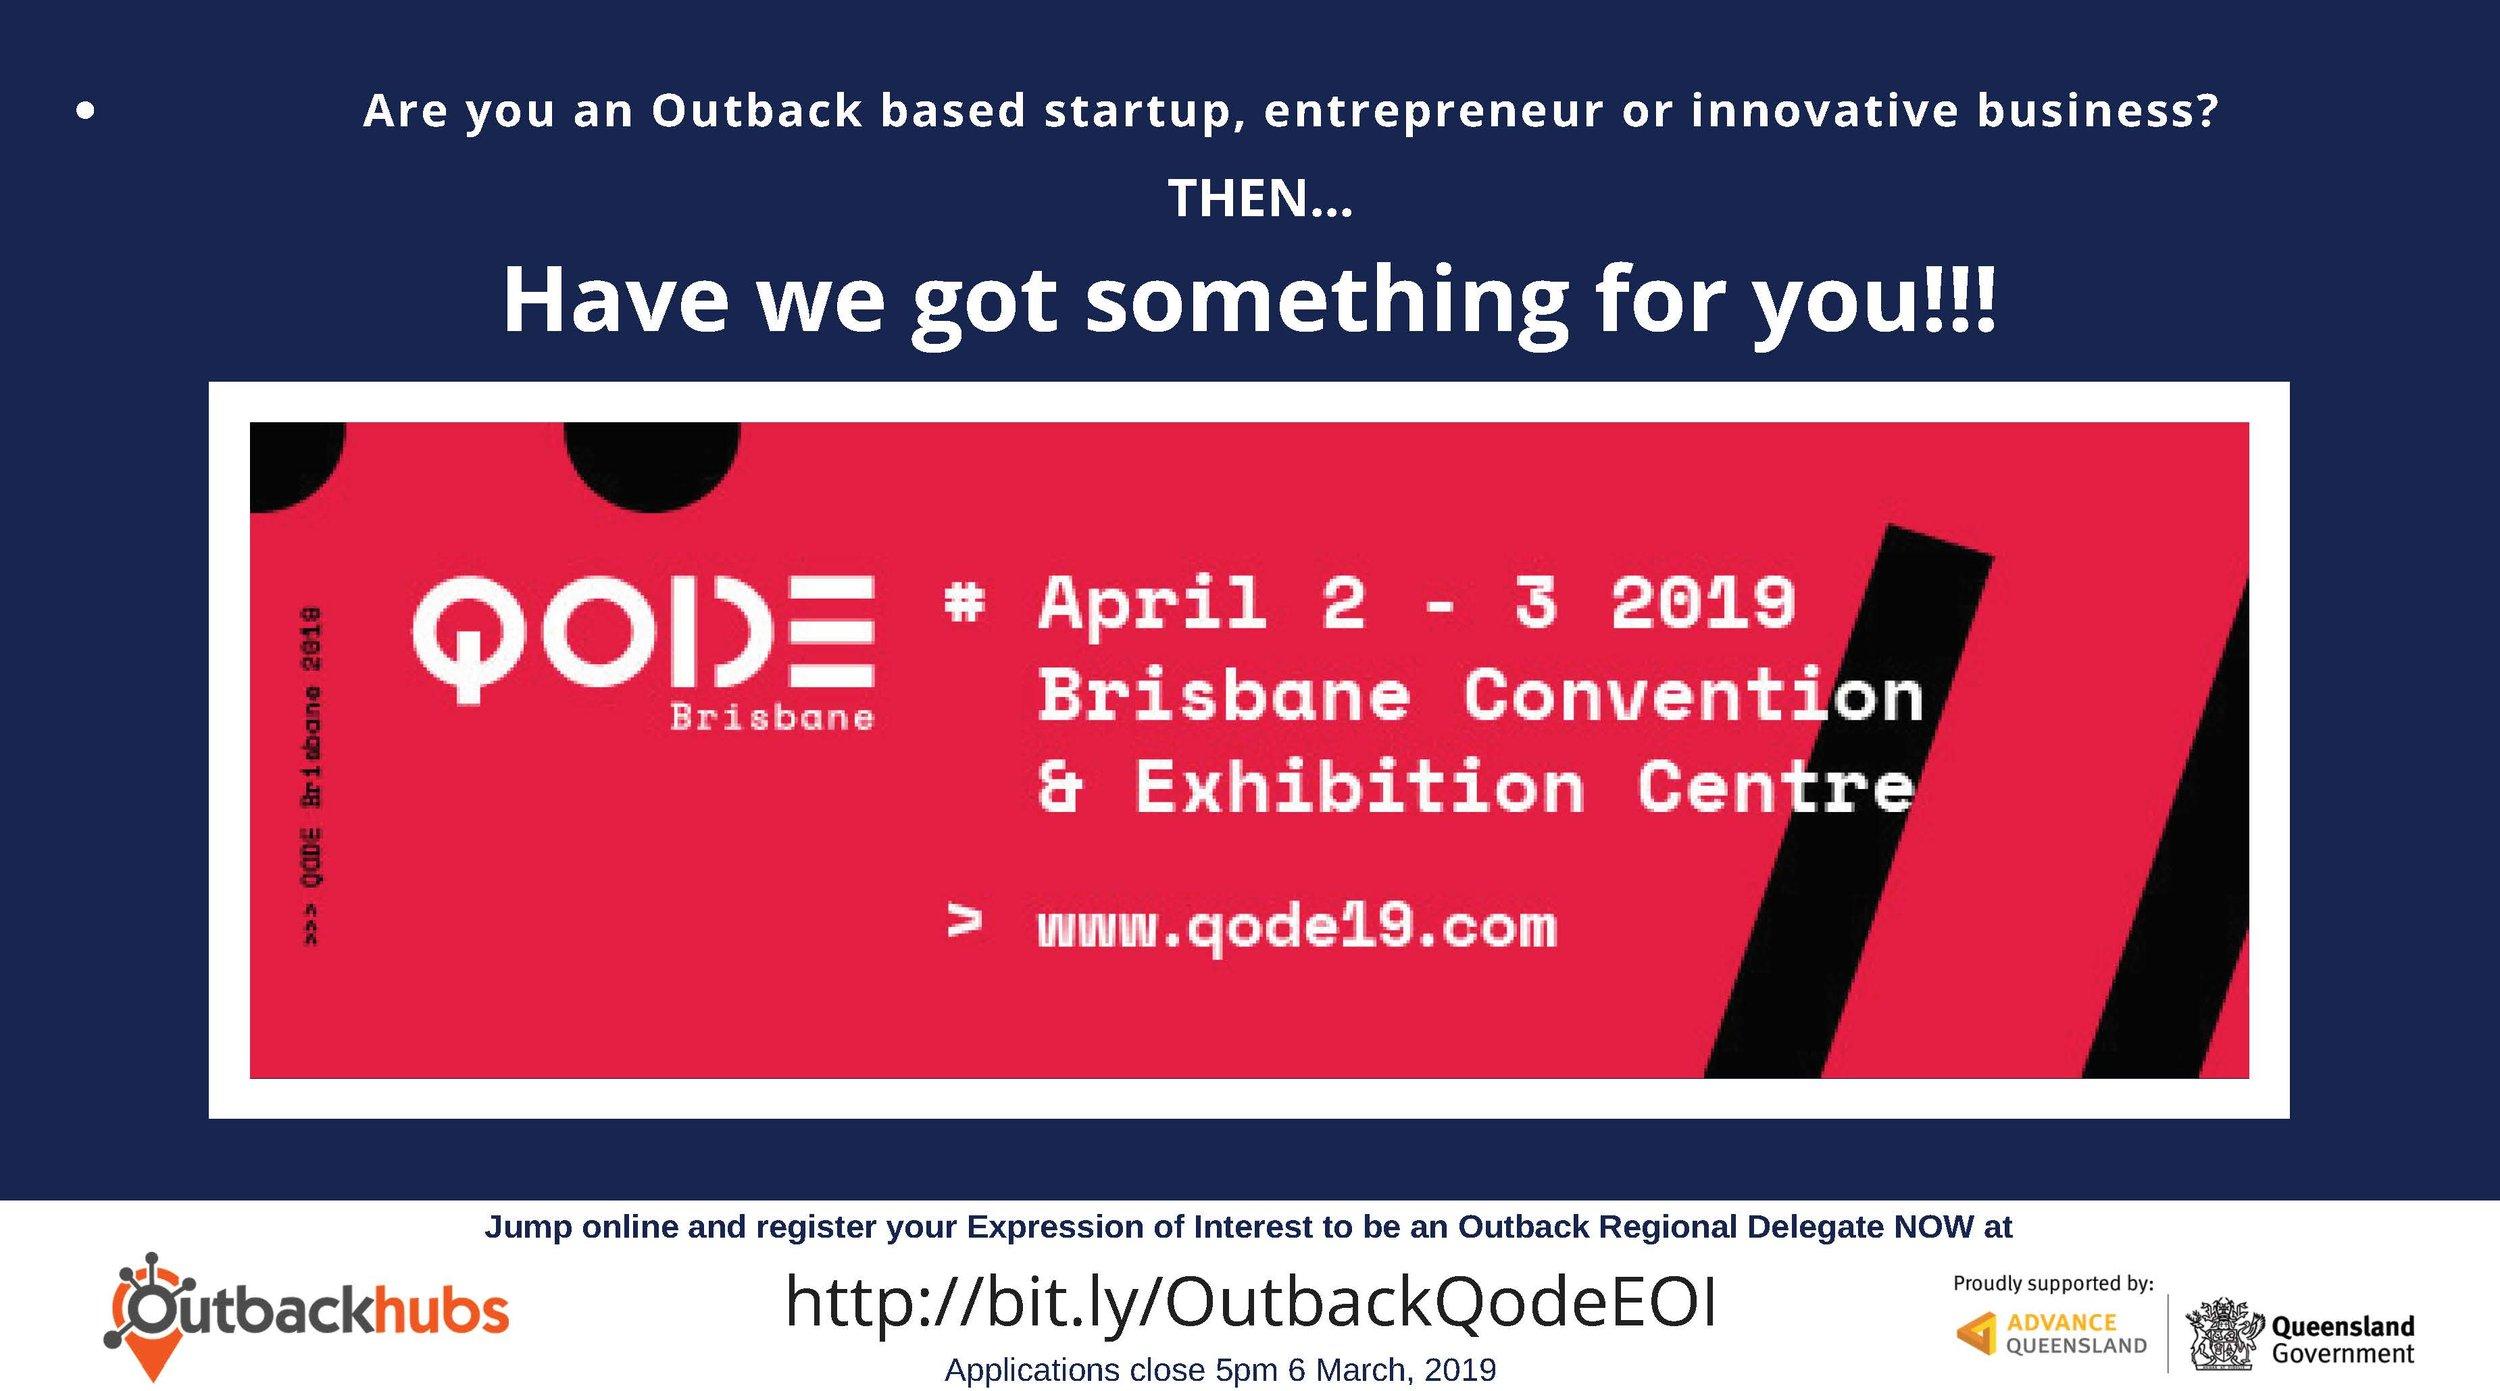 Outback Delegation EOI QODE 2019 SM graphic.jpg